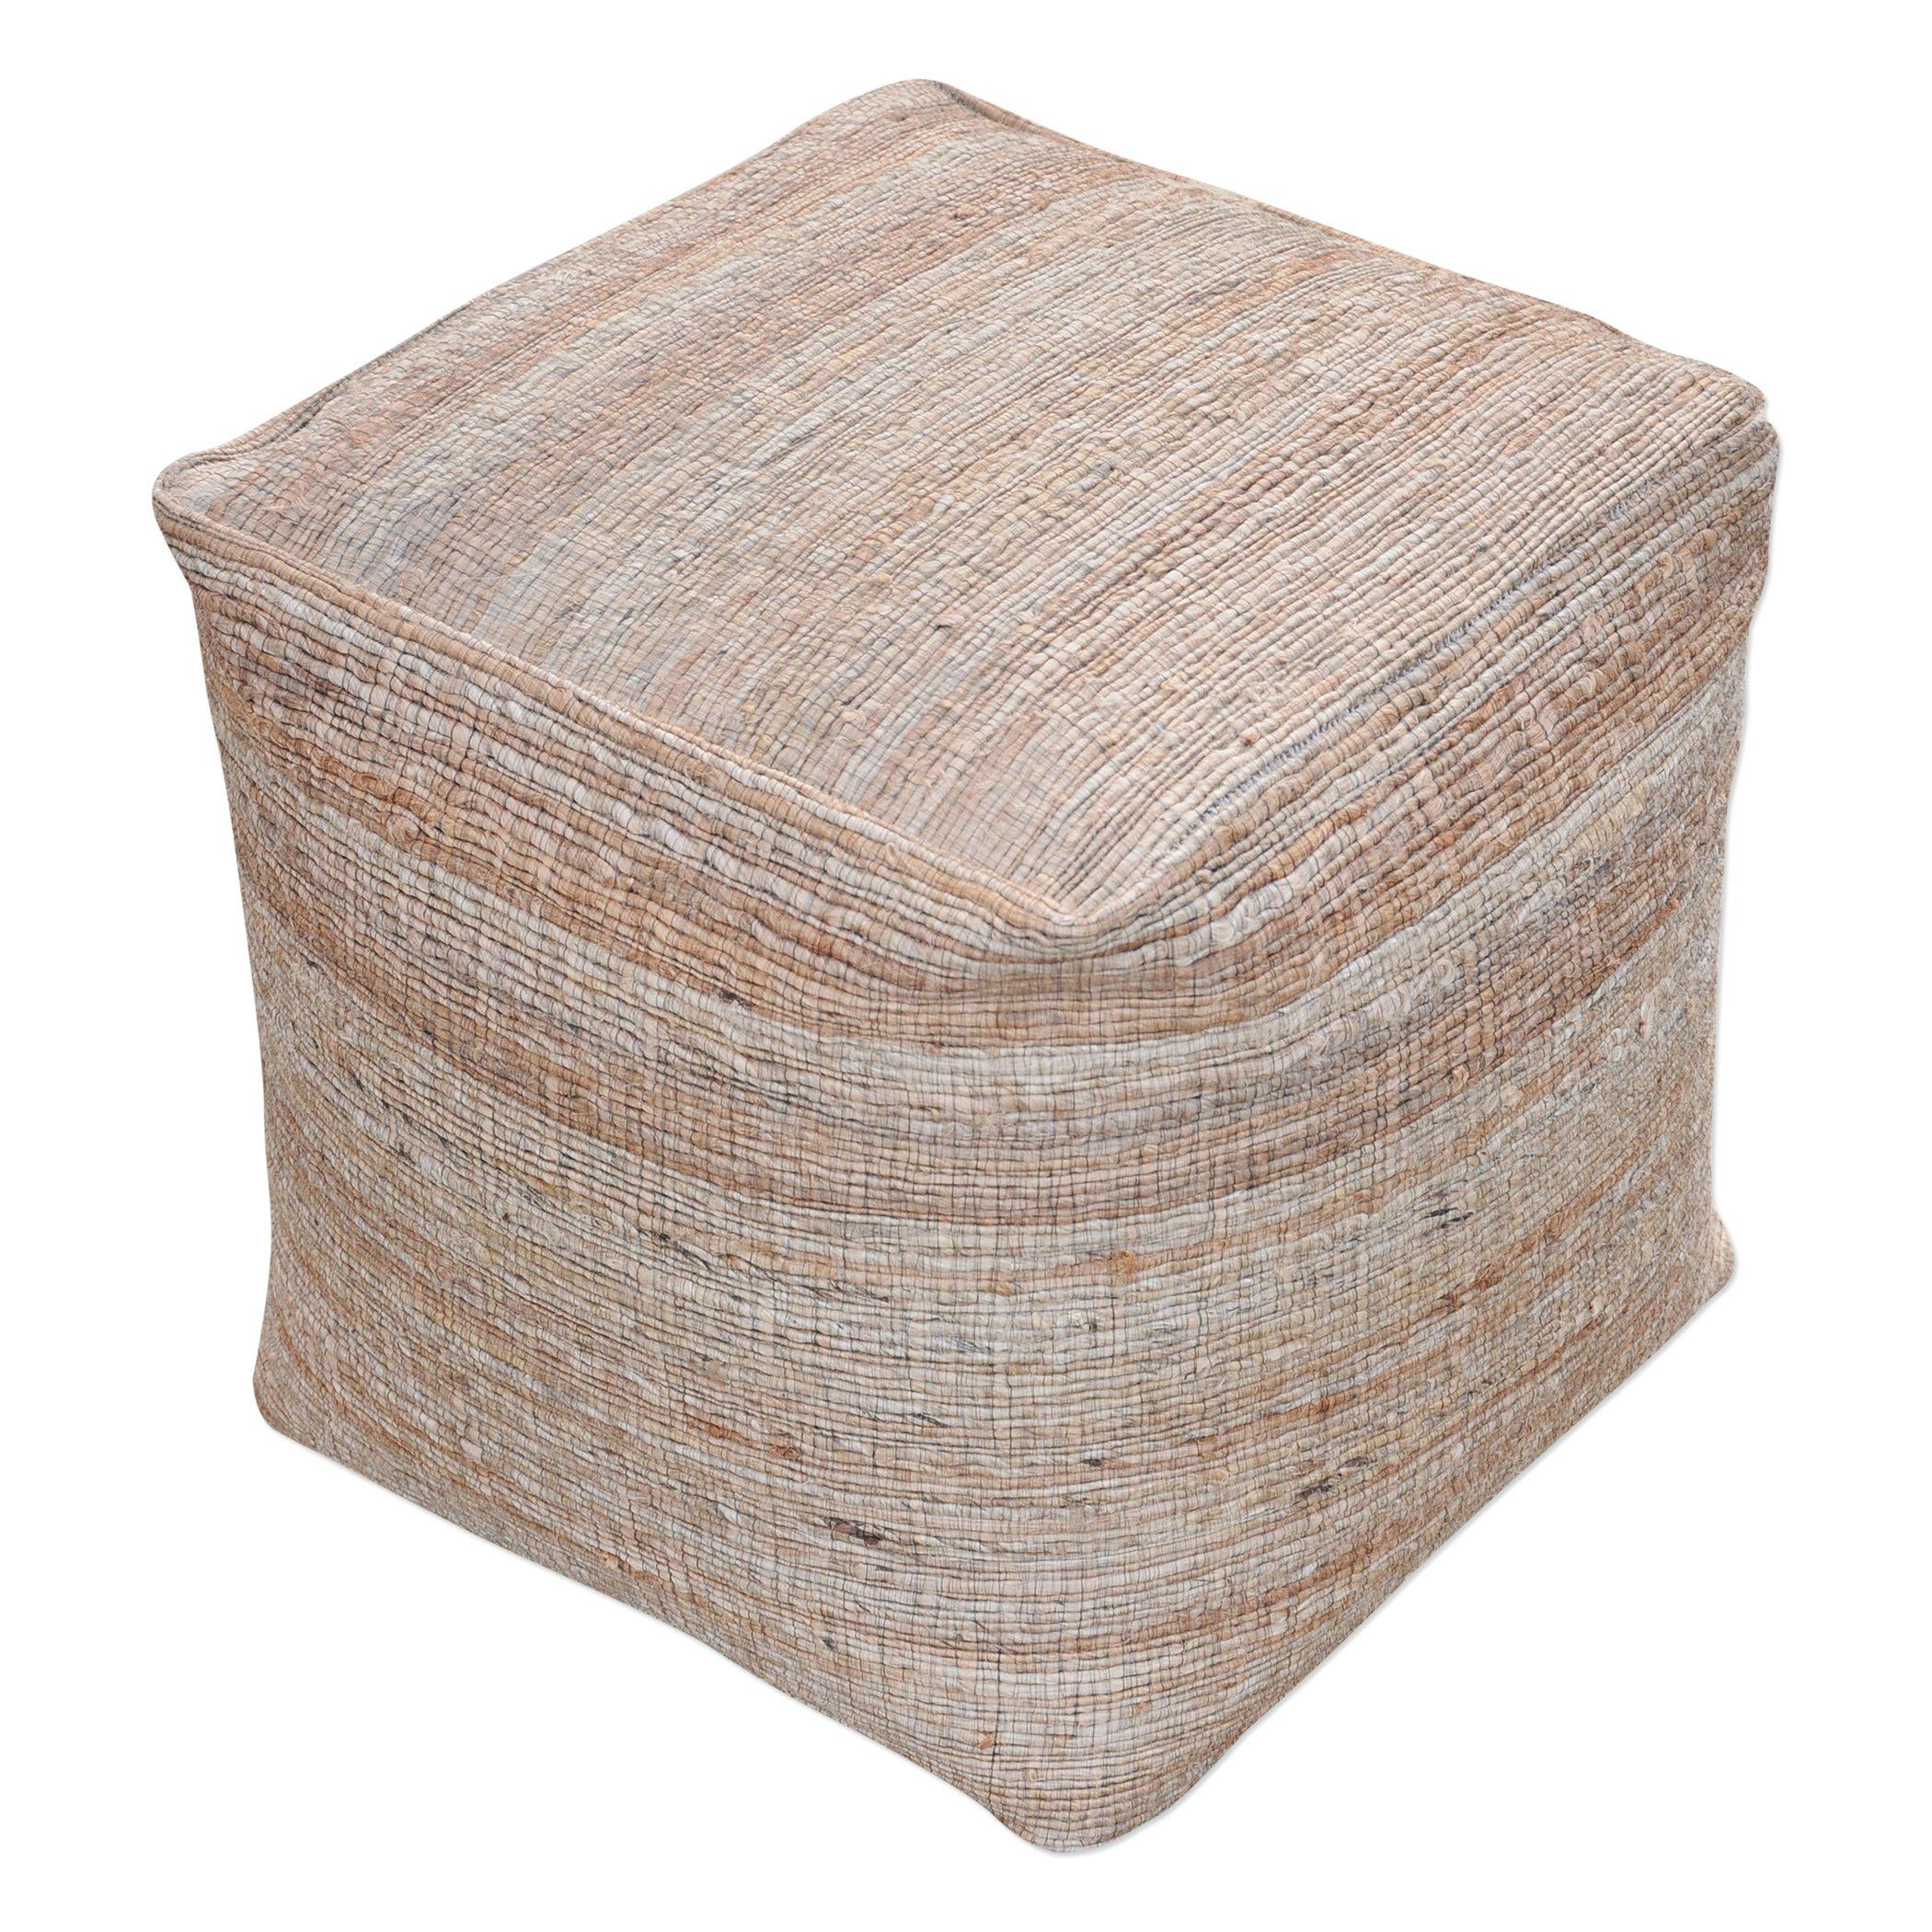 Soft Striped Brown Tan Pouf | Natural Hemp Cube Earth Tones Neutral Seat Square